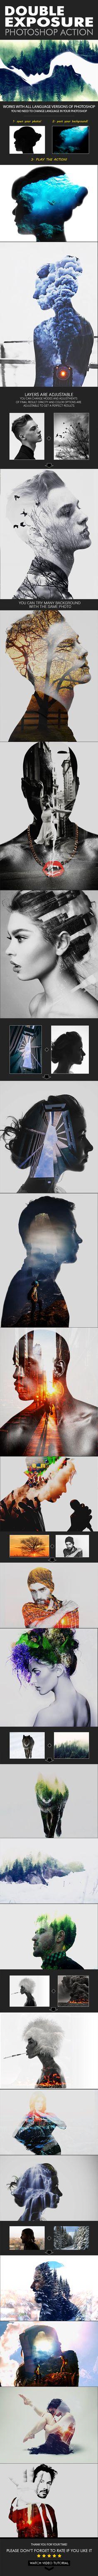 Double Exposure #Action - Actions #Photoshop Download here:  https://graphicriver.net/item/double-exposure-action/19588604?ref=alena994